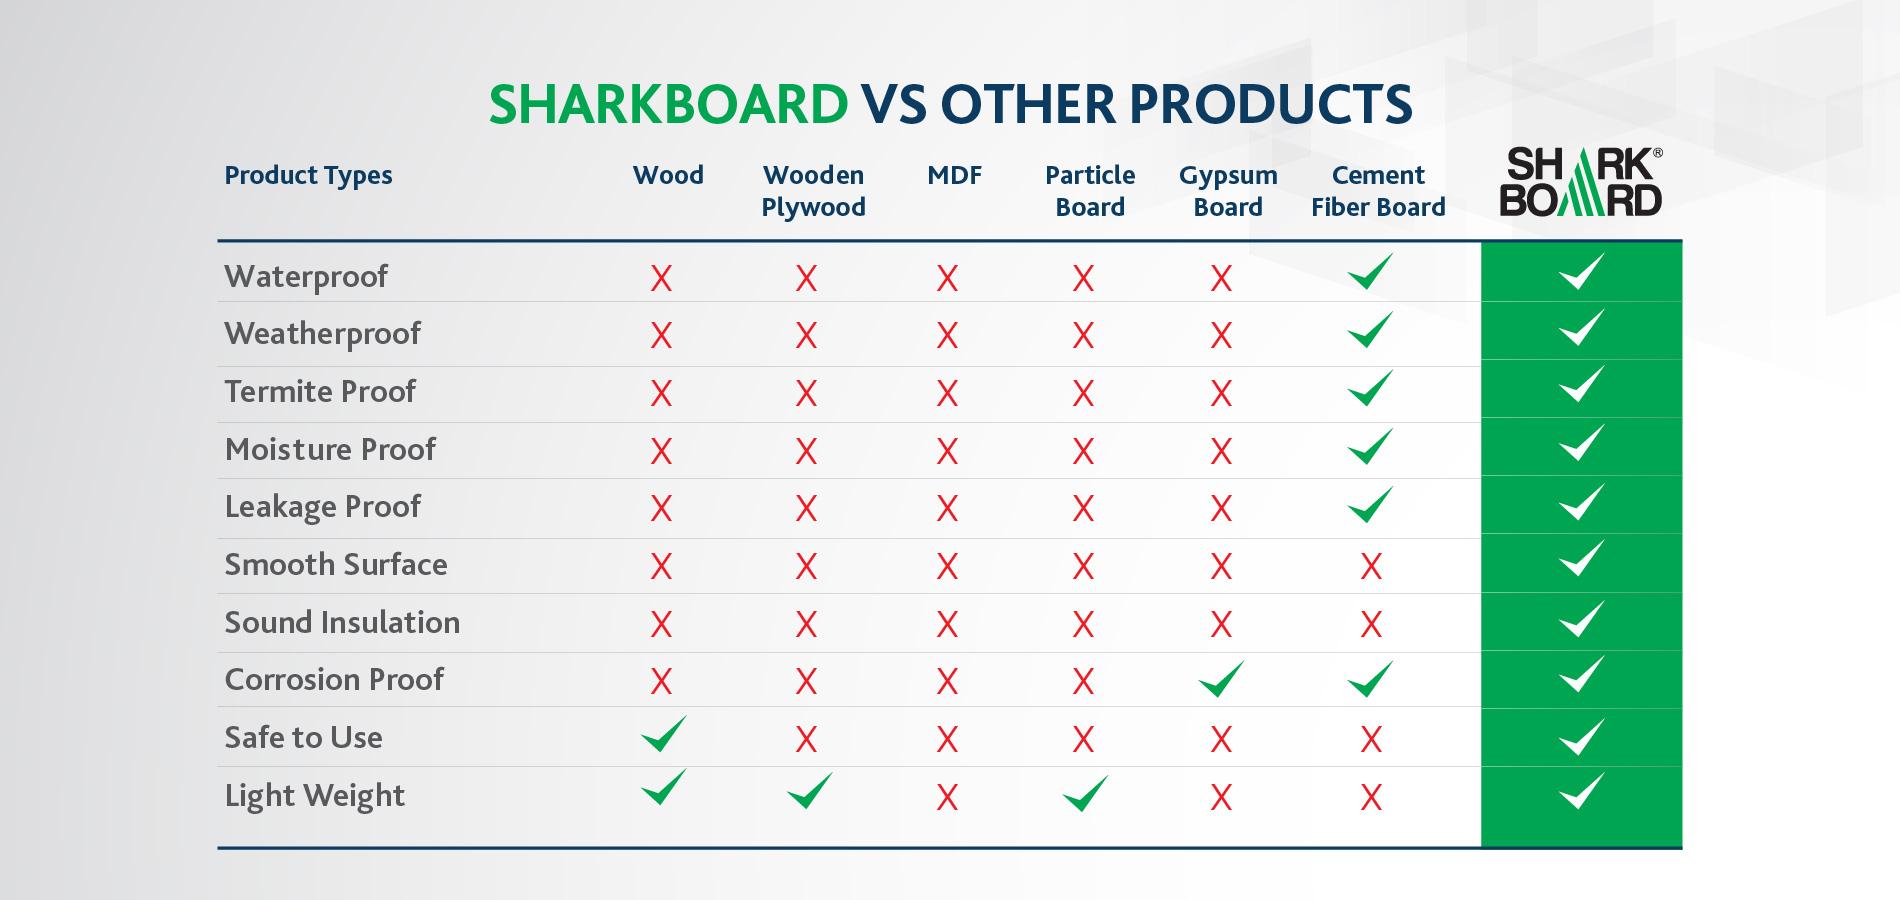 Sharkboard Compare Table